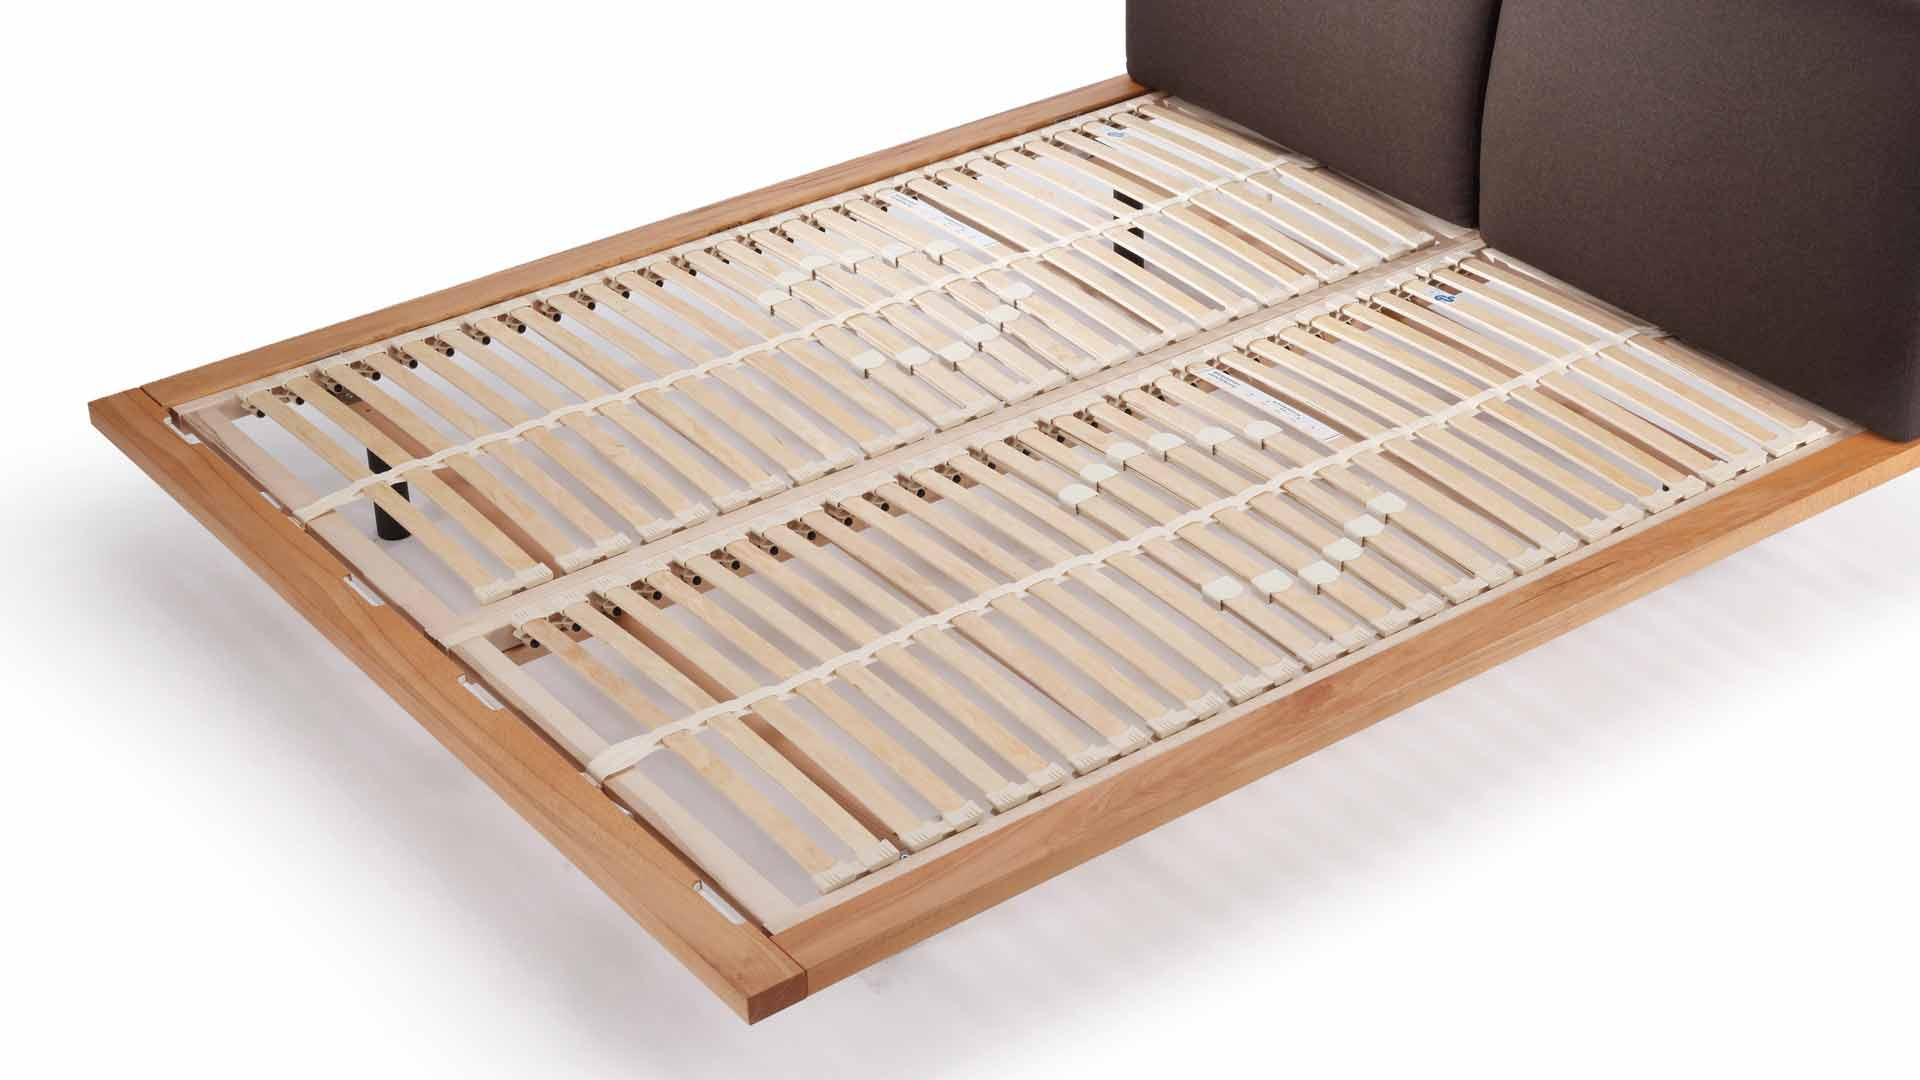 betten hoenscheidt duesseldorf holzlattenrost betten h nscheidt. Black Bedroom Furniture Sets. Home Design Ideas